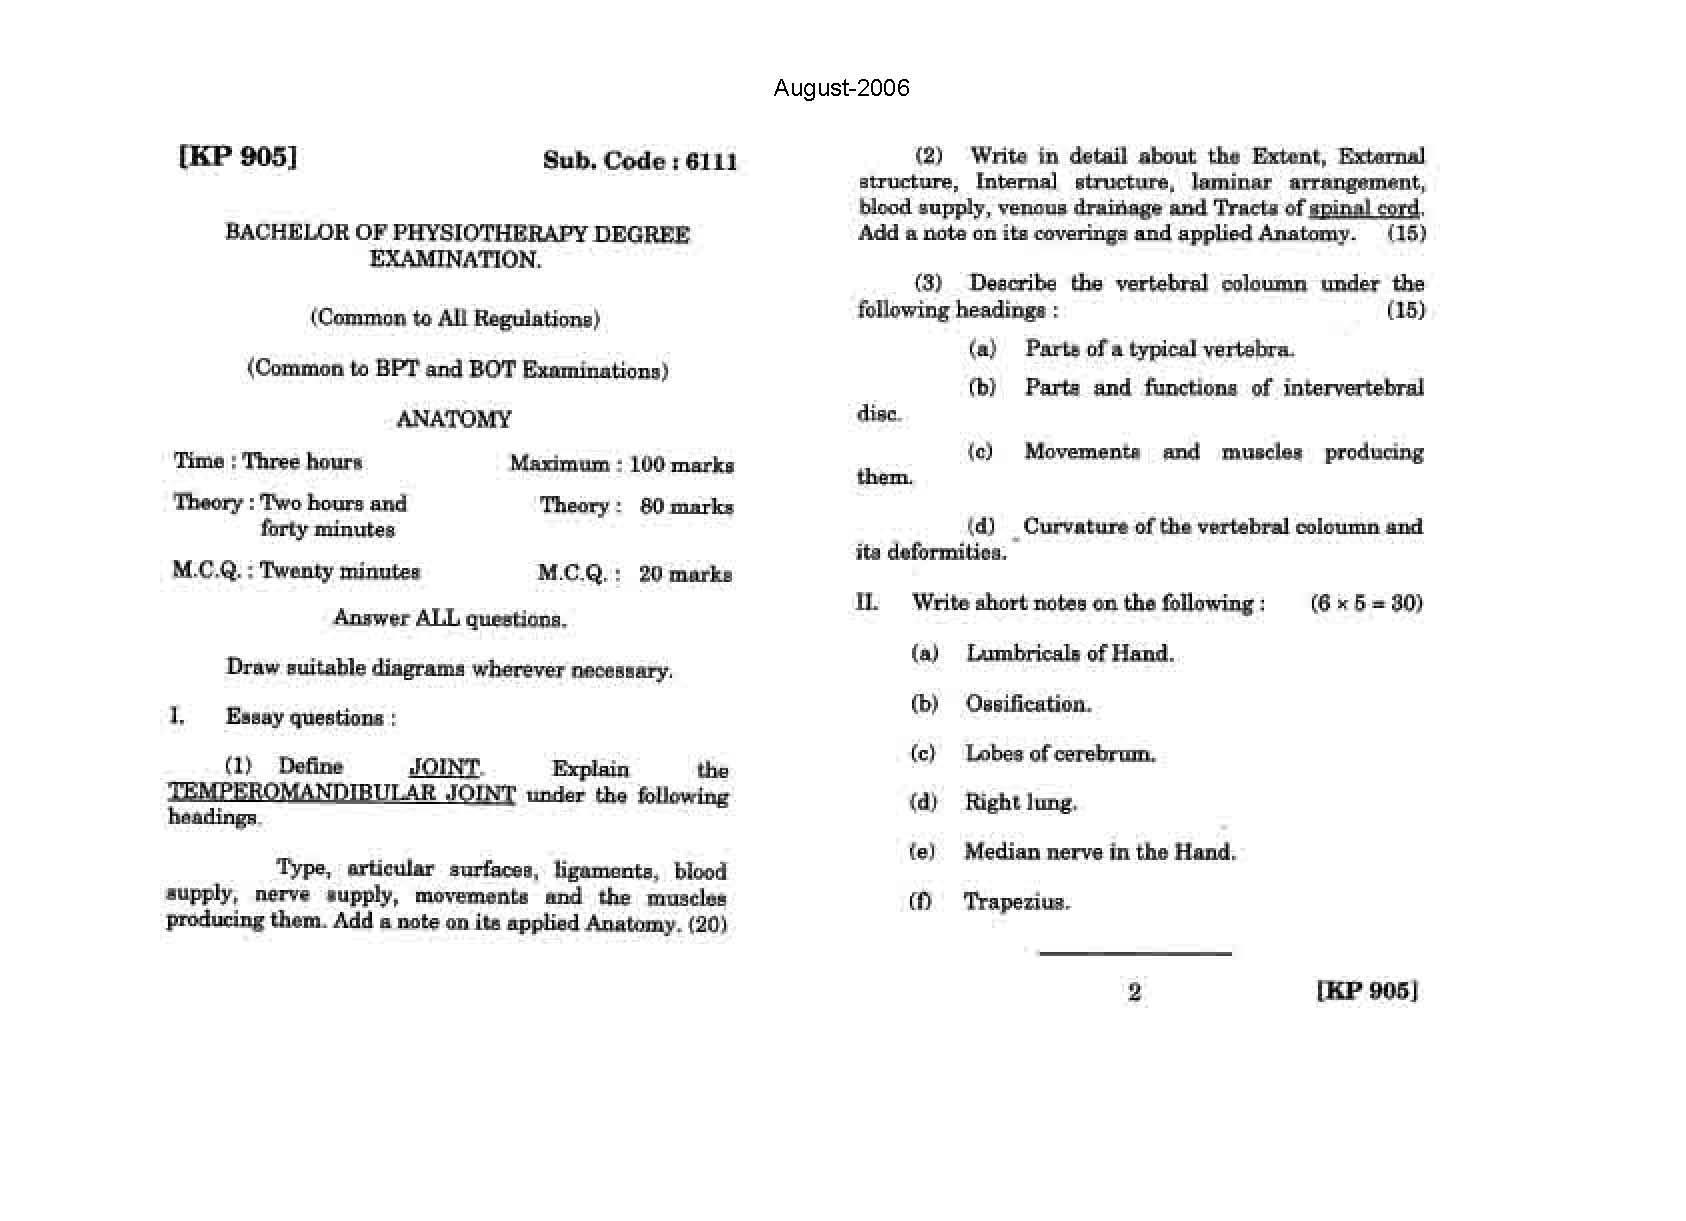 The Tamil Nadu Dr Mgr Medical University General Anatomy August